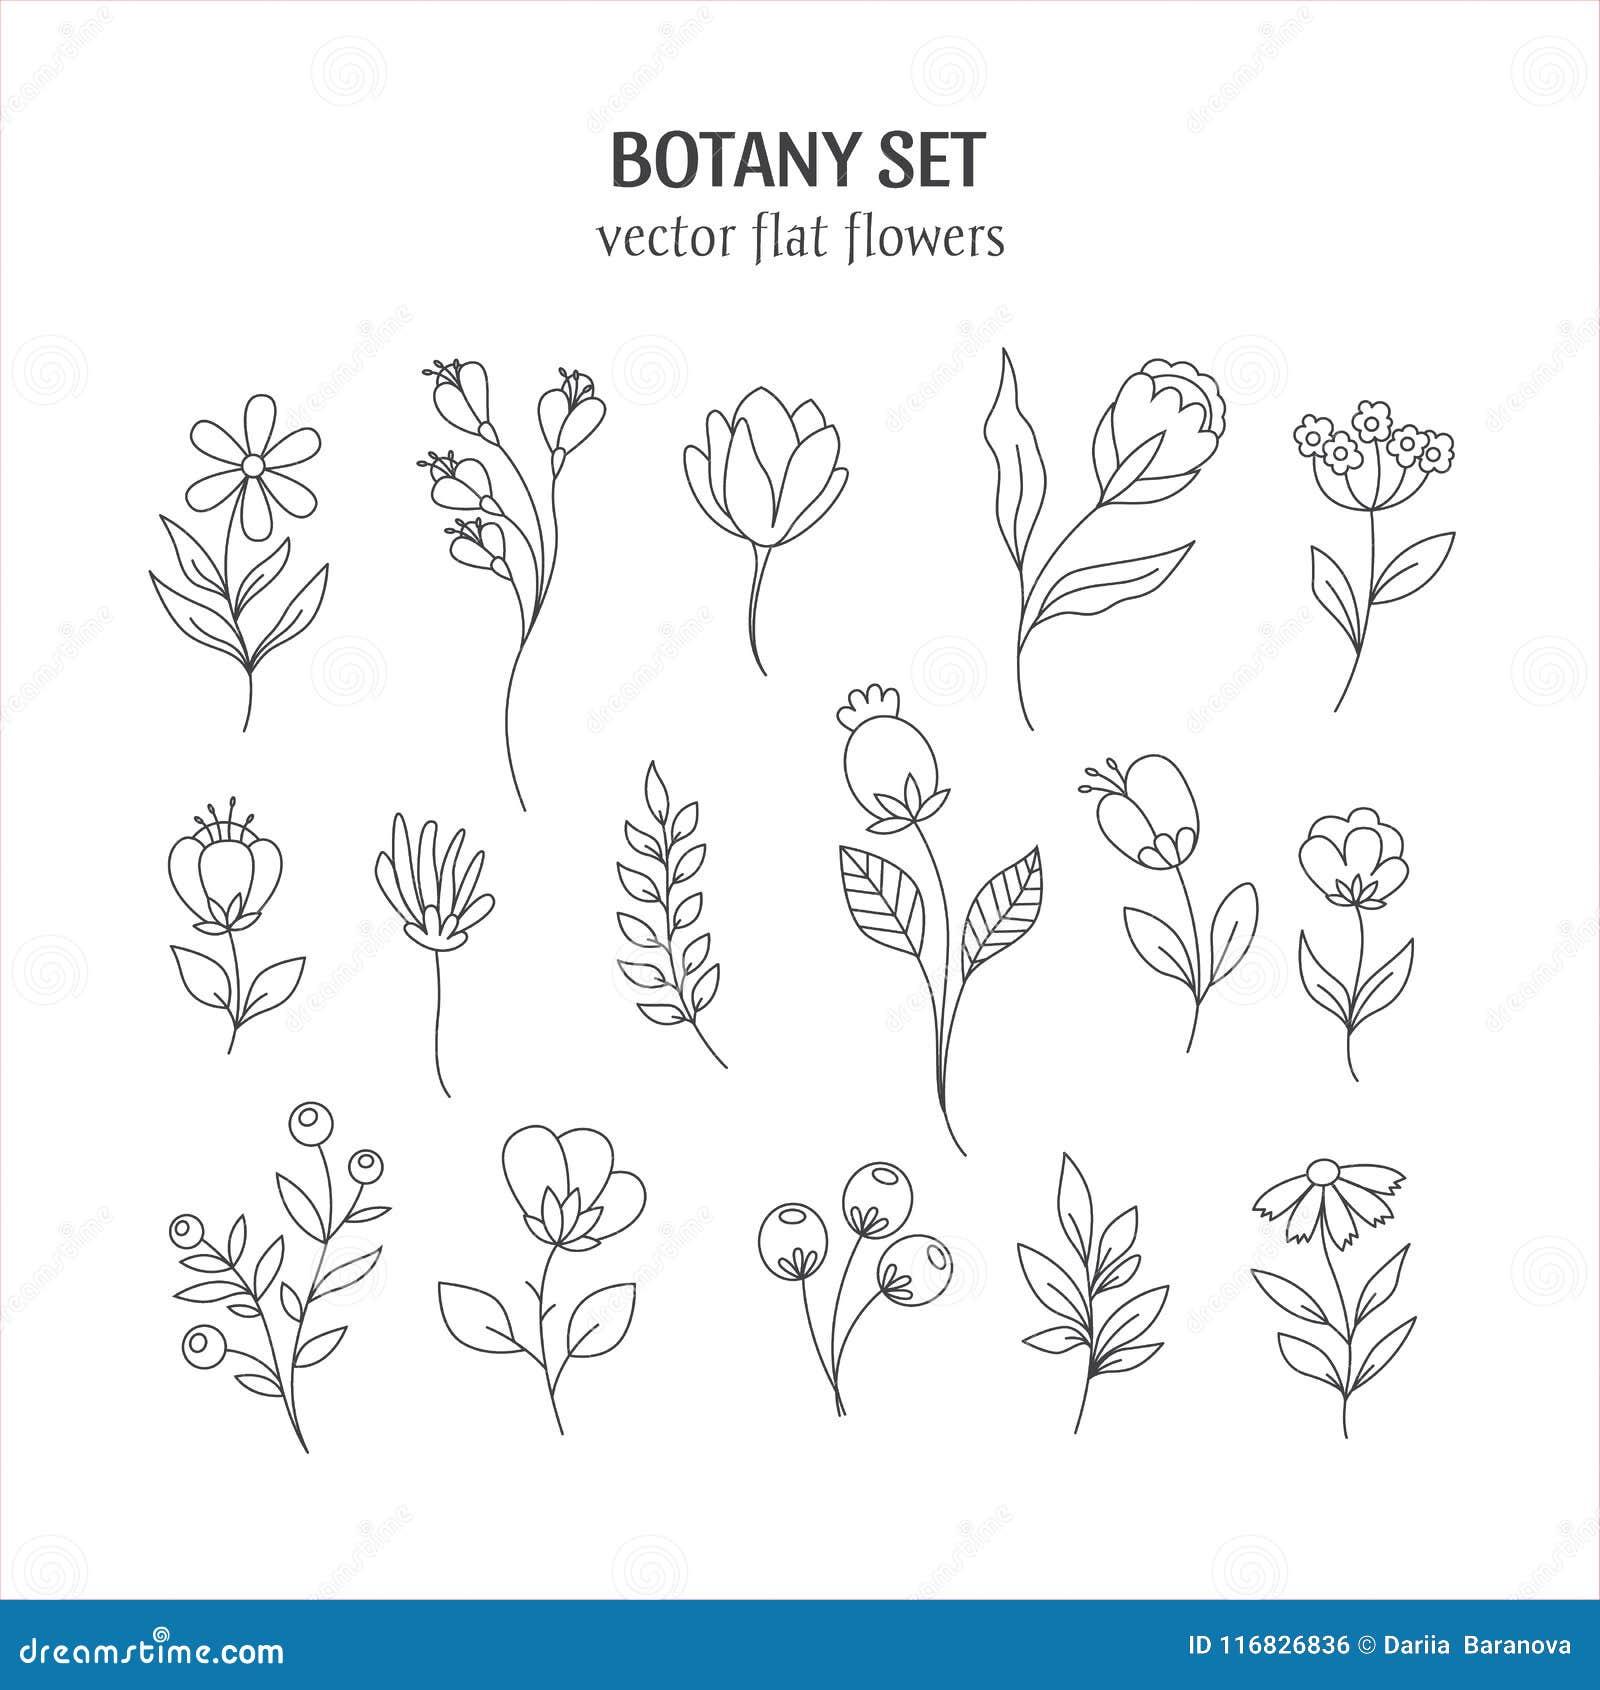 Flower Line Art Images: Line Botany Collection Stock Vector. Illustration Of